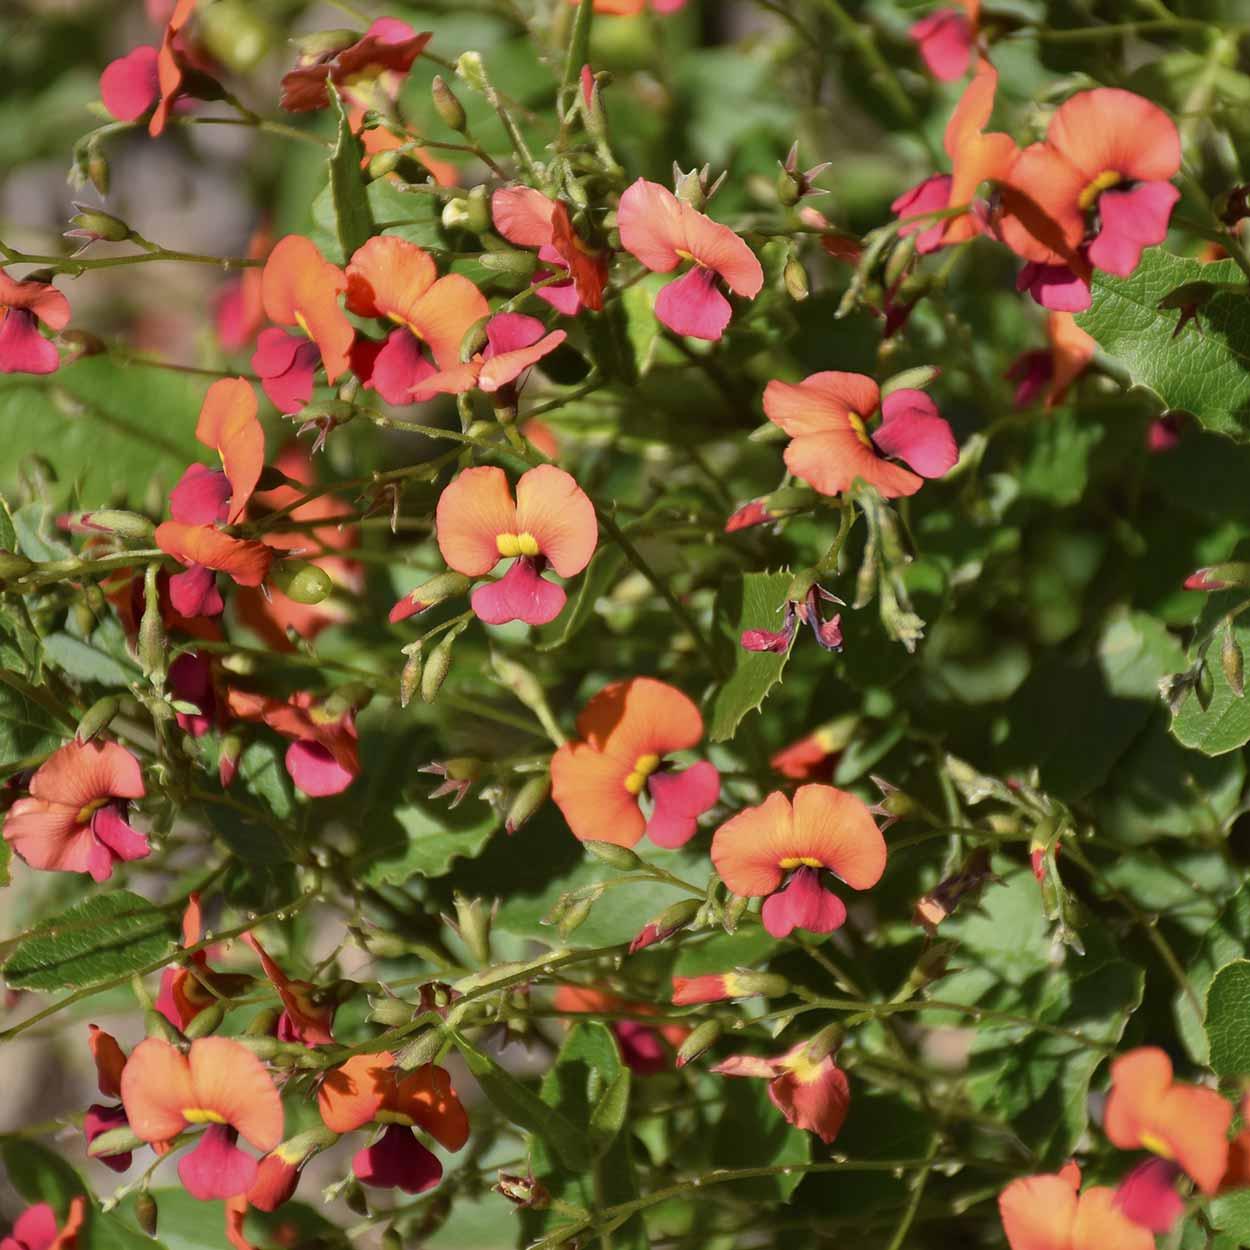 Flame Pea (Chorizema varium x ilicifolia), Kings Park, Perth, Western Australia